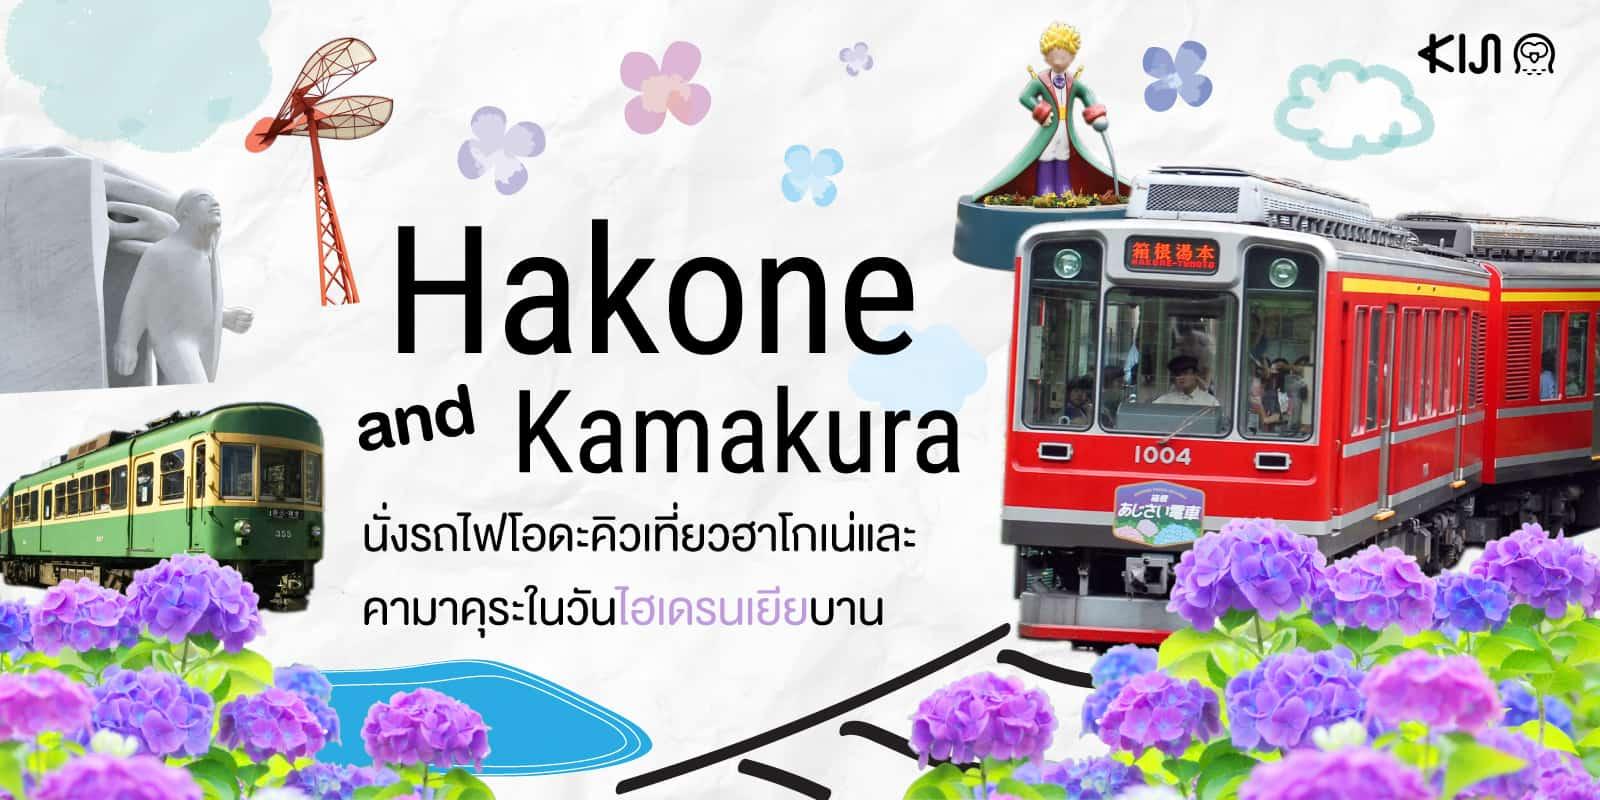 Hakone and Kamakura